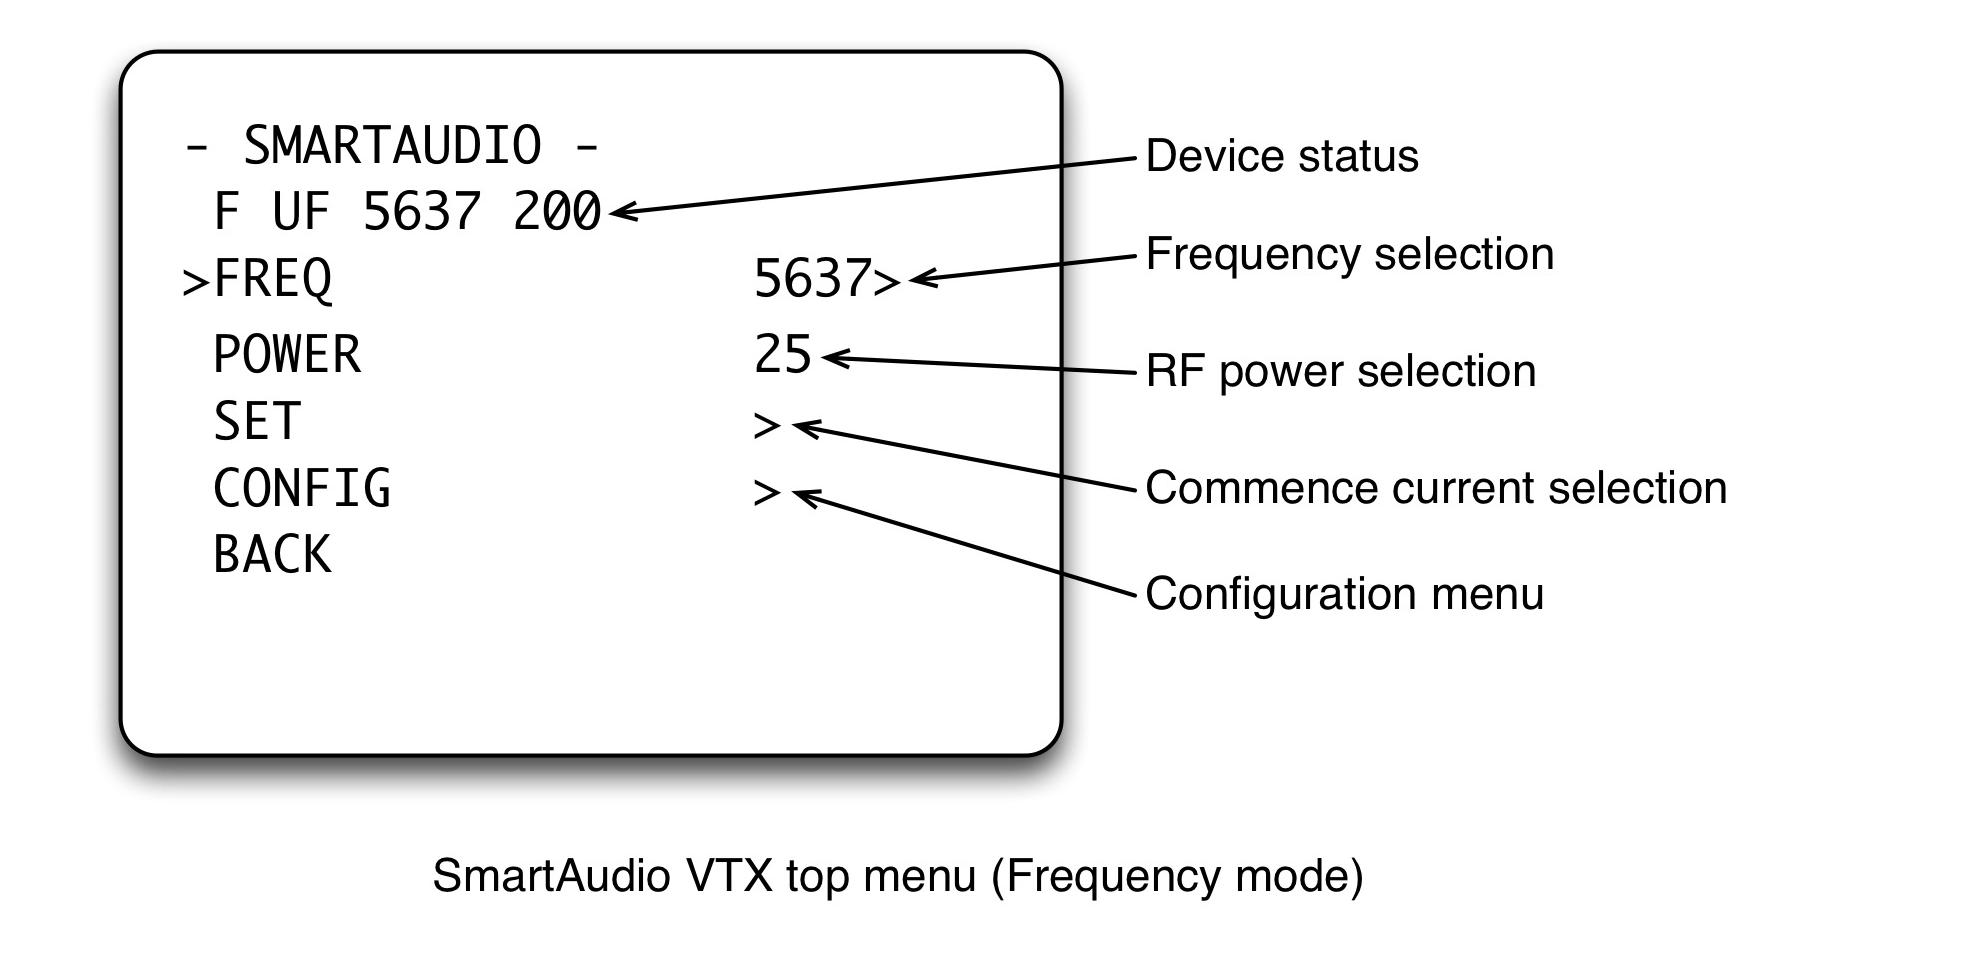 SmartAudio CMS Top menu (Frequency mode)